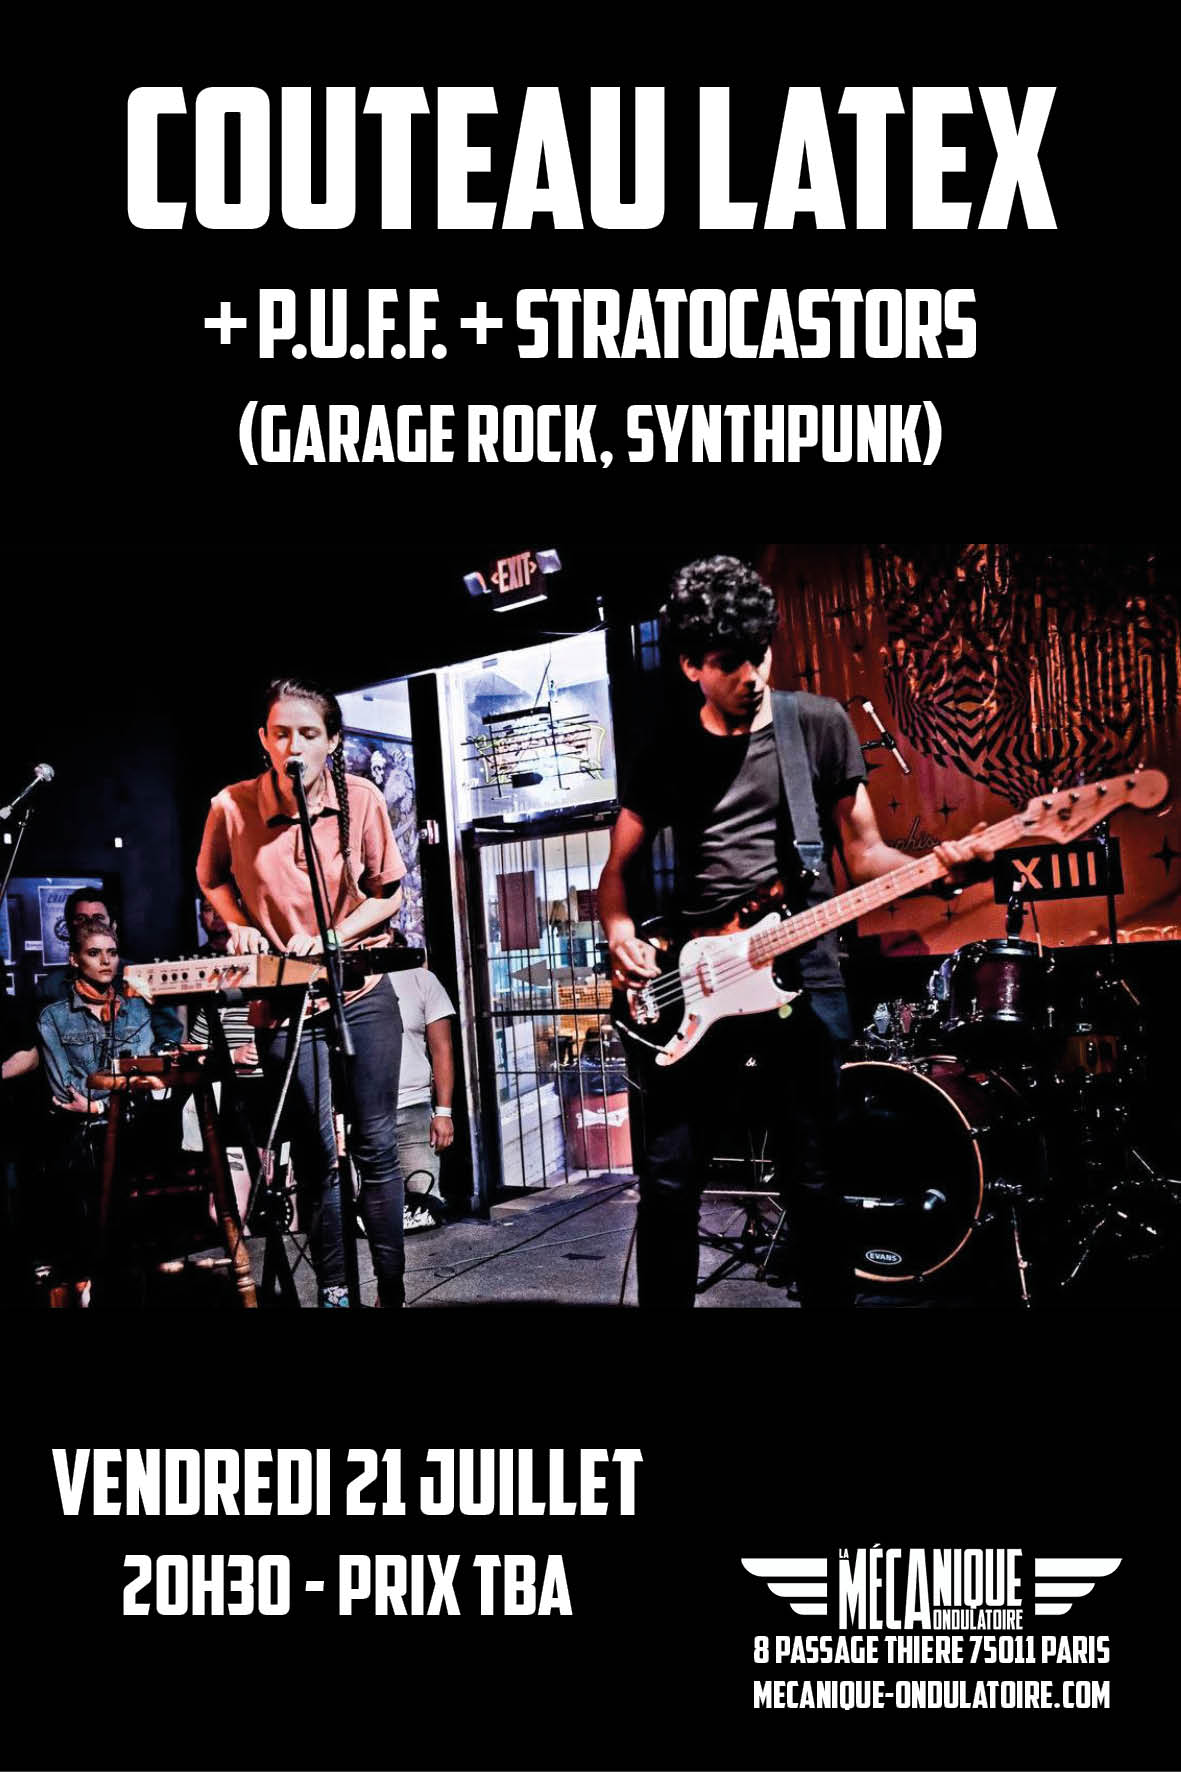 COUTEAU LATEX + P.U.F.F + STRATOCASTORS // 21.07